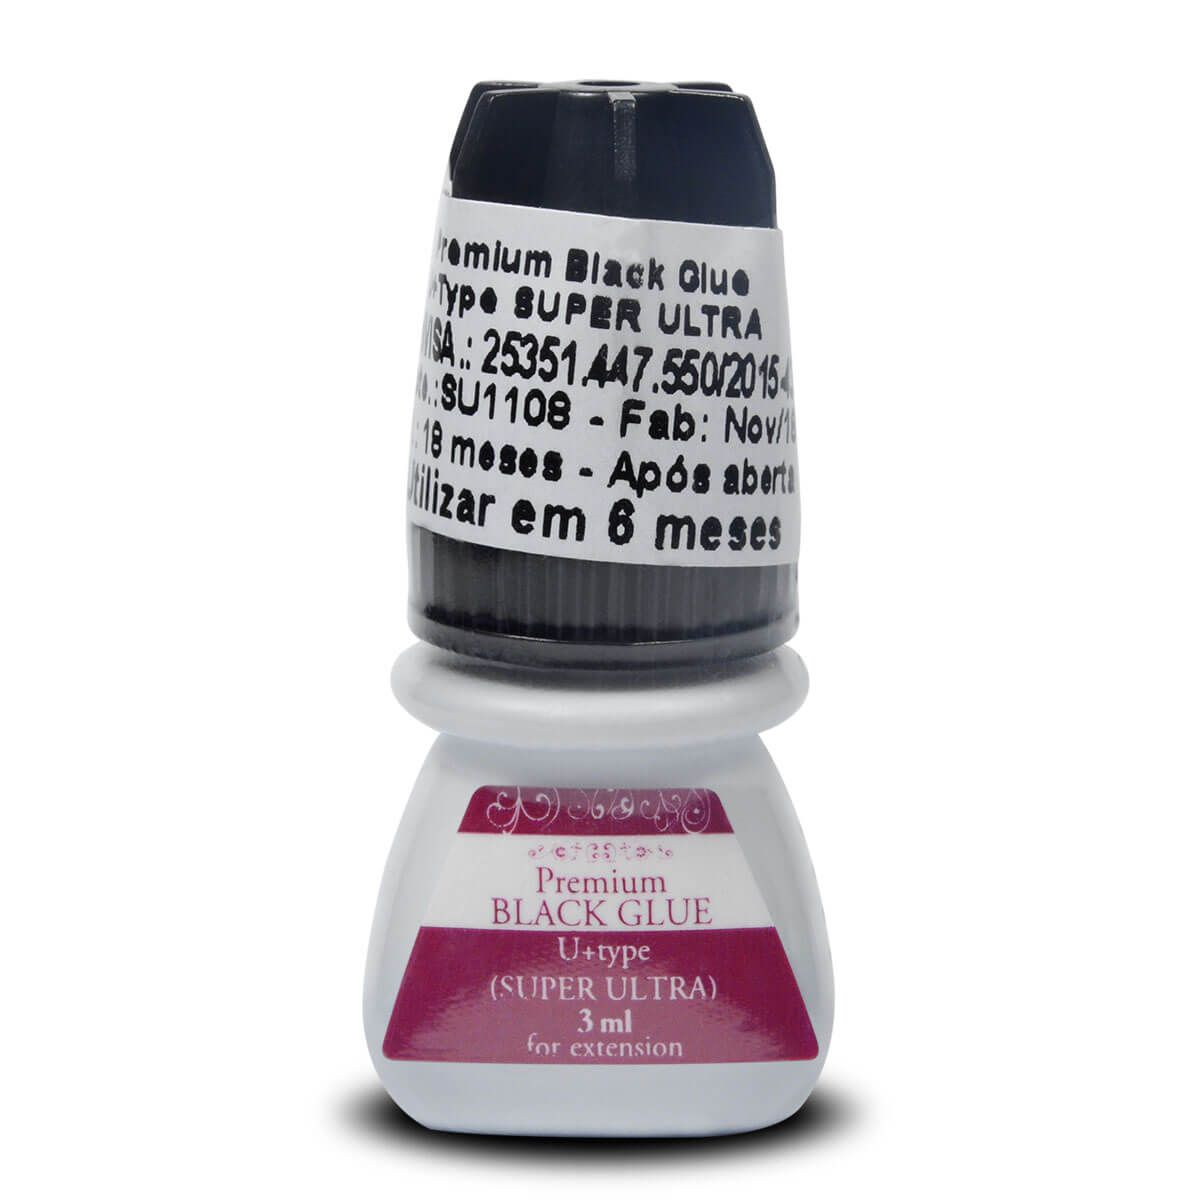 Cola Premium Black U+type Super Ultra 3ml